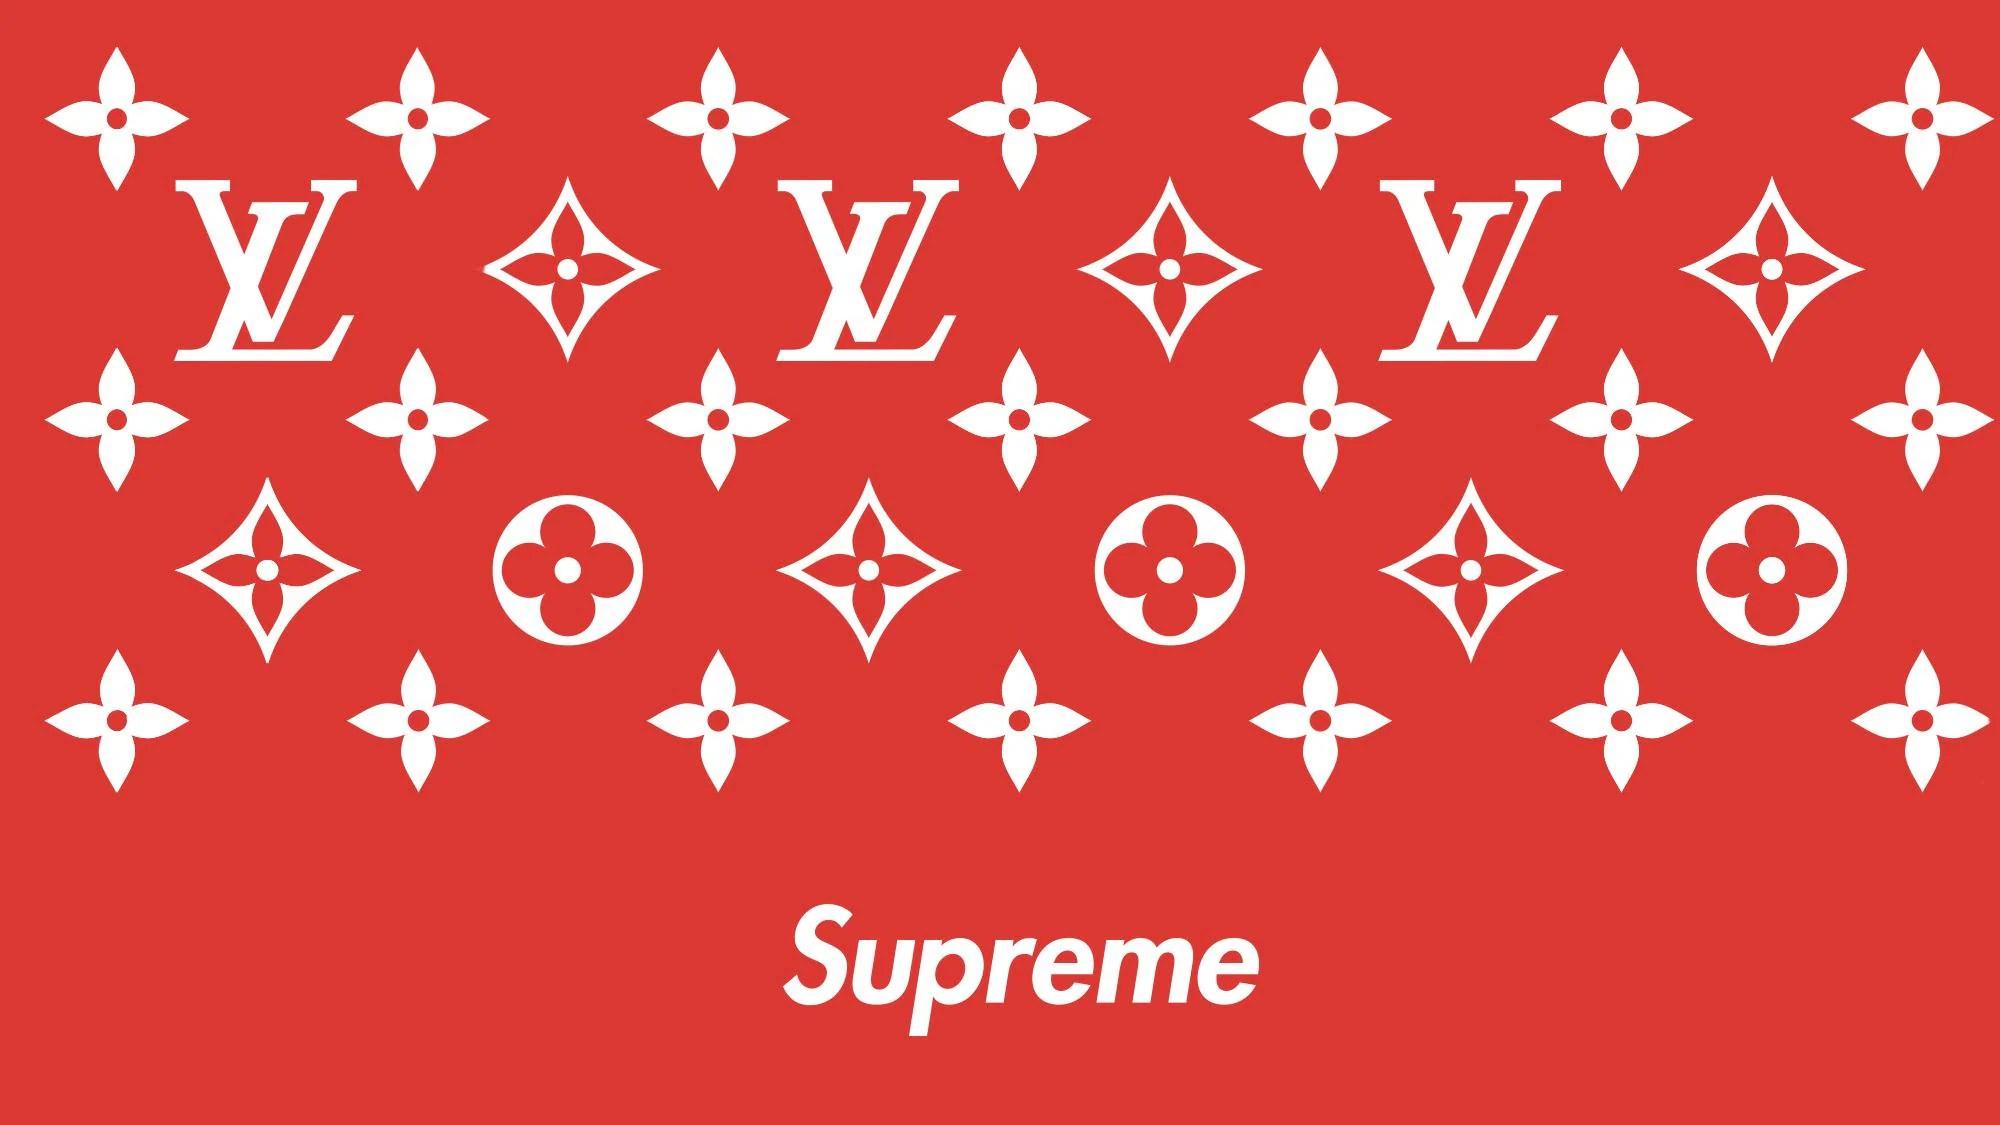 Supreme X Louis Vuitton Wallpaper Iphone Louis Vuitton X Supreme